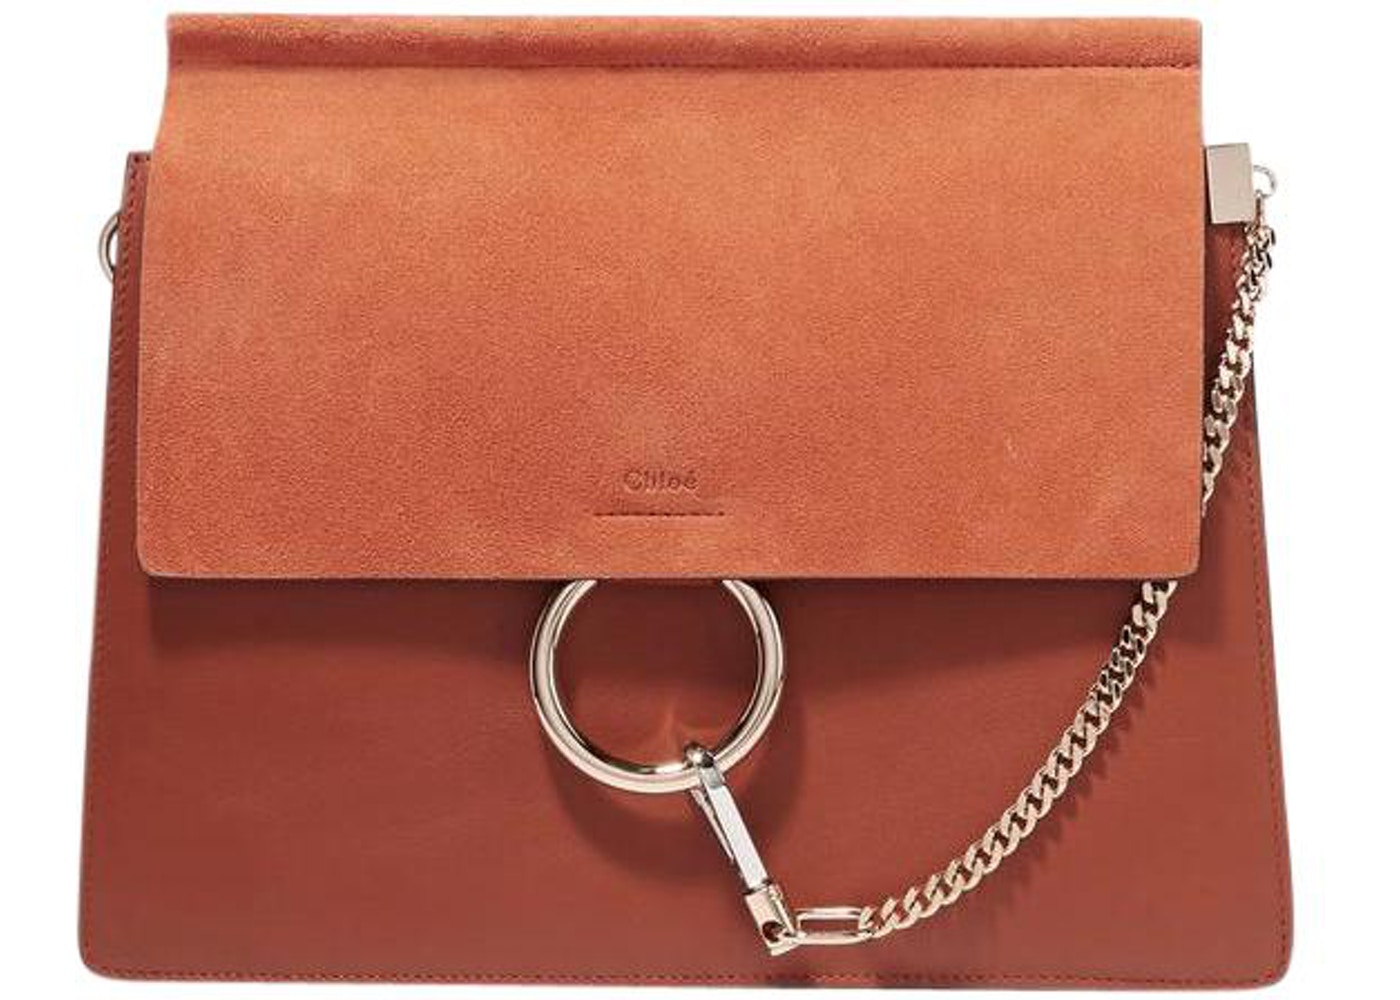 7744213ff51 Buy & Sell Chloe Faye Handbags - Price Premium